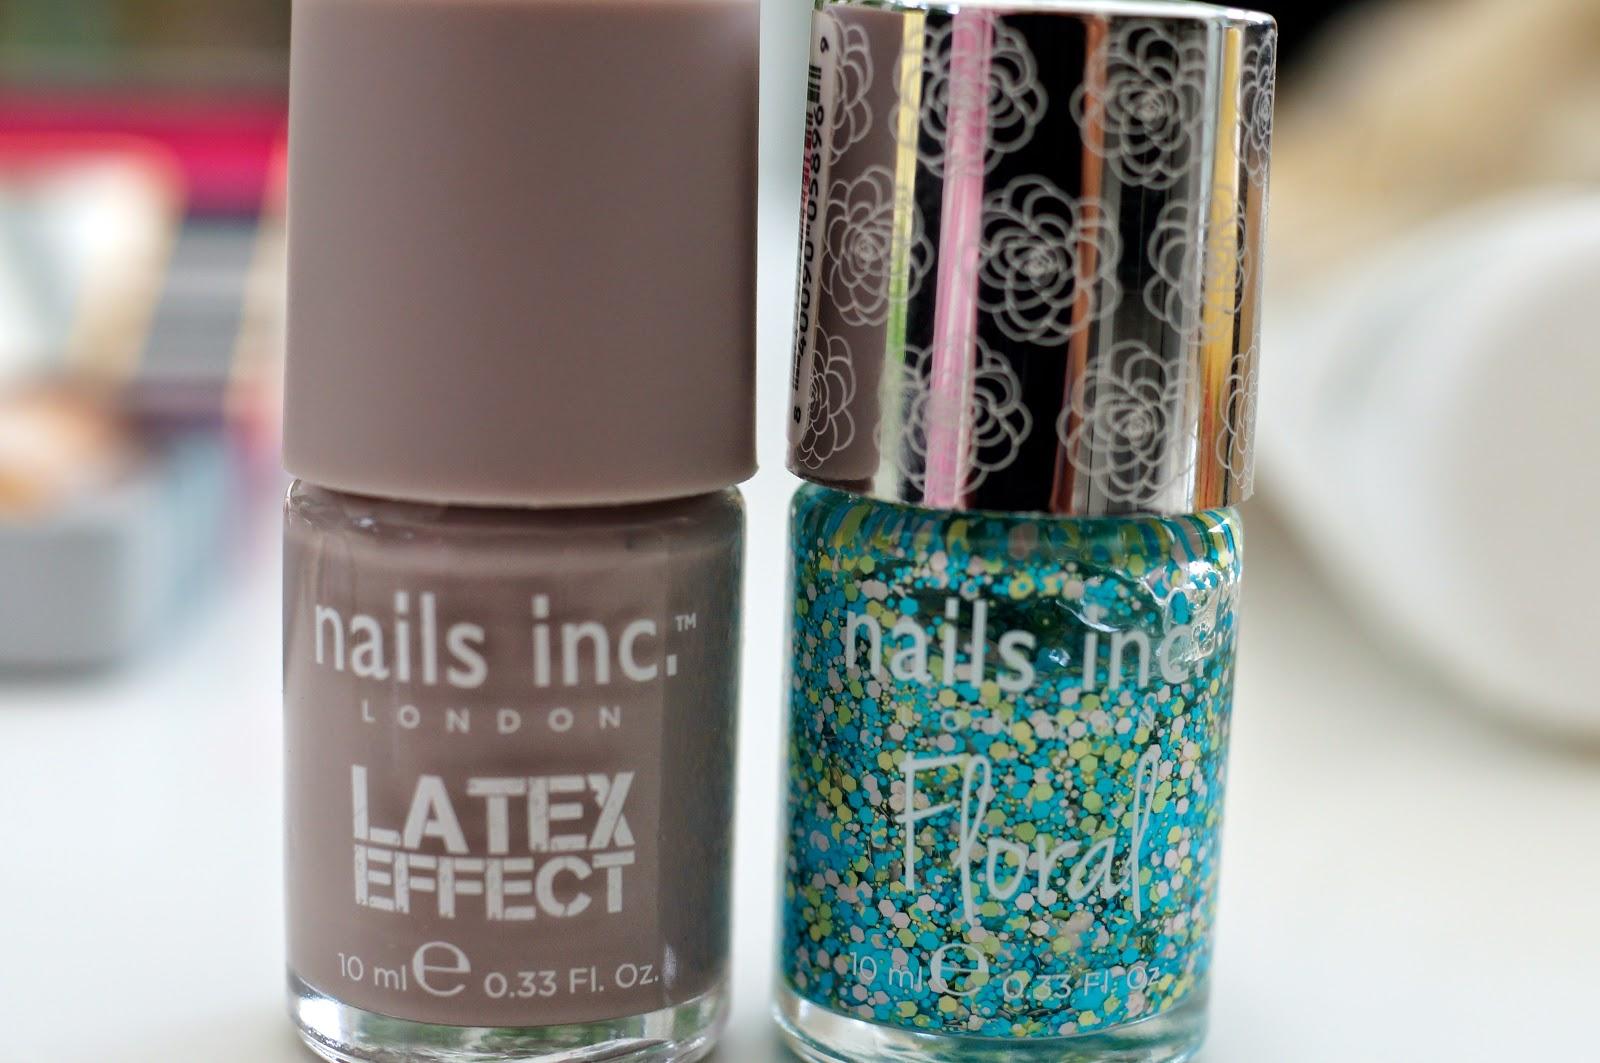 nails inc richmond varnish